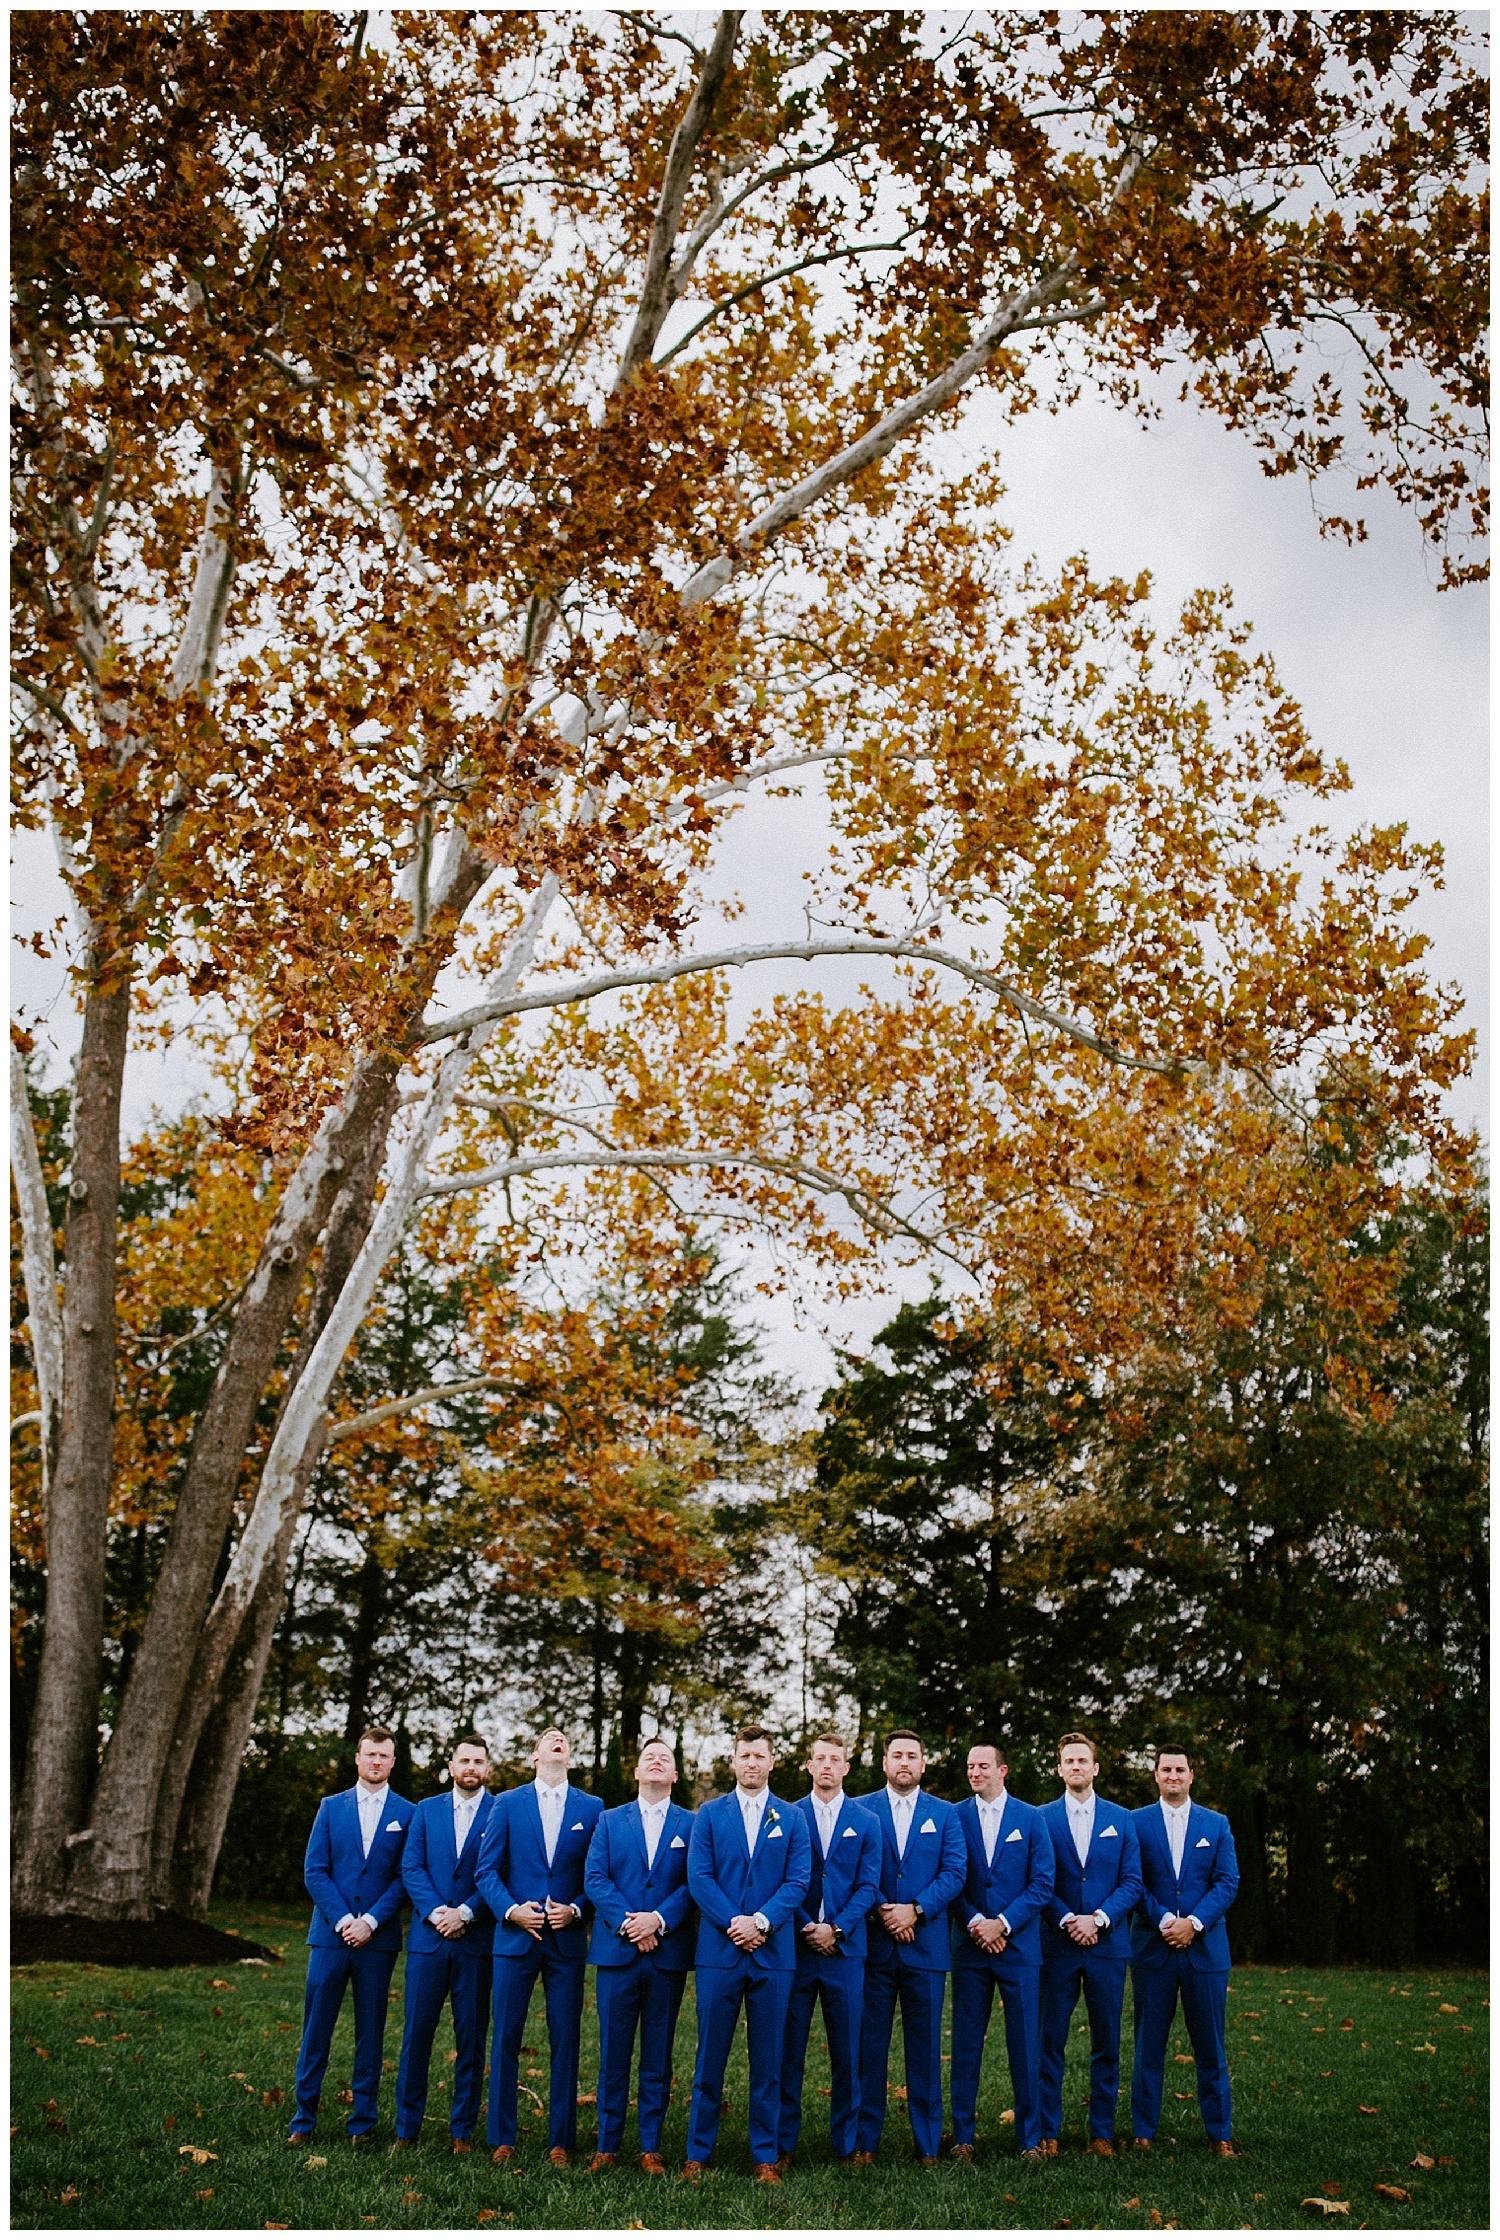 classy-wedding-sycamore_farms-nashville-tn2019-01-22_0041.jpg